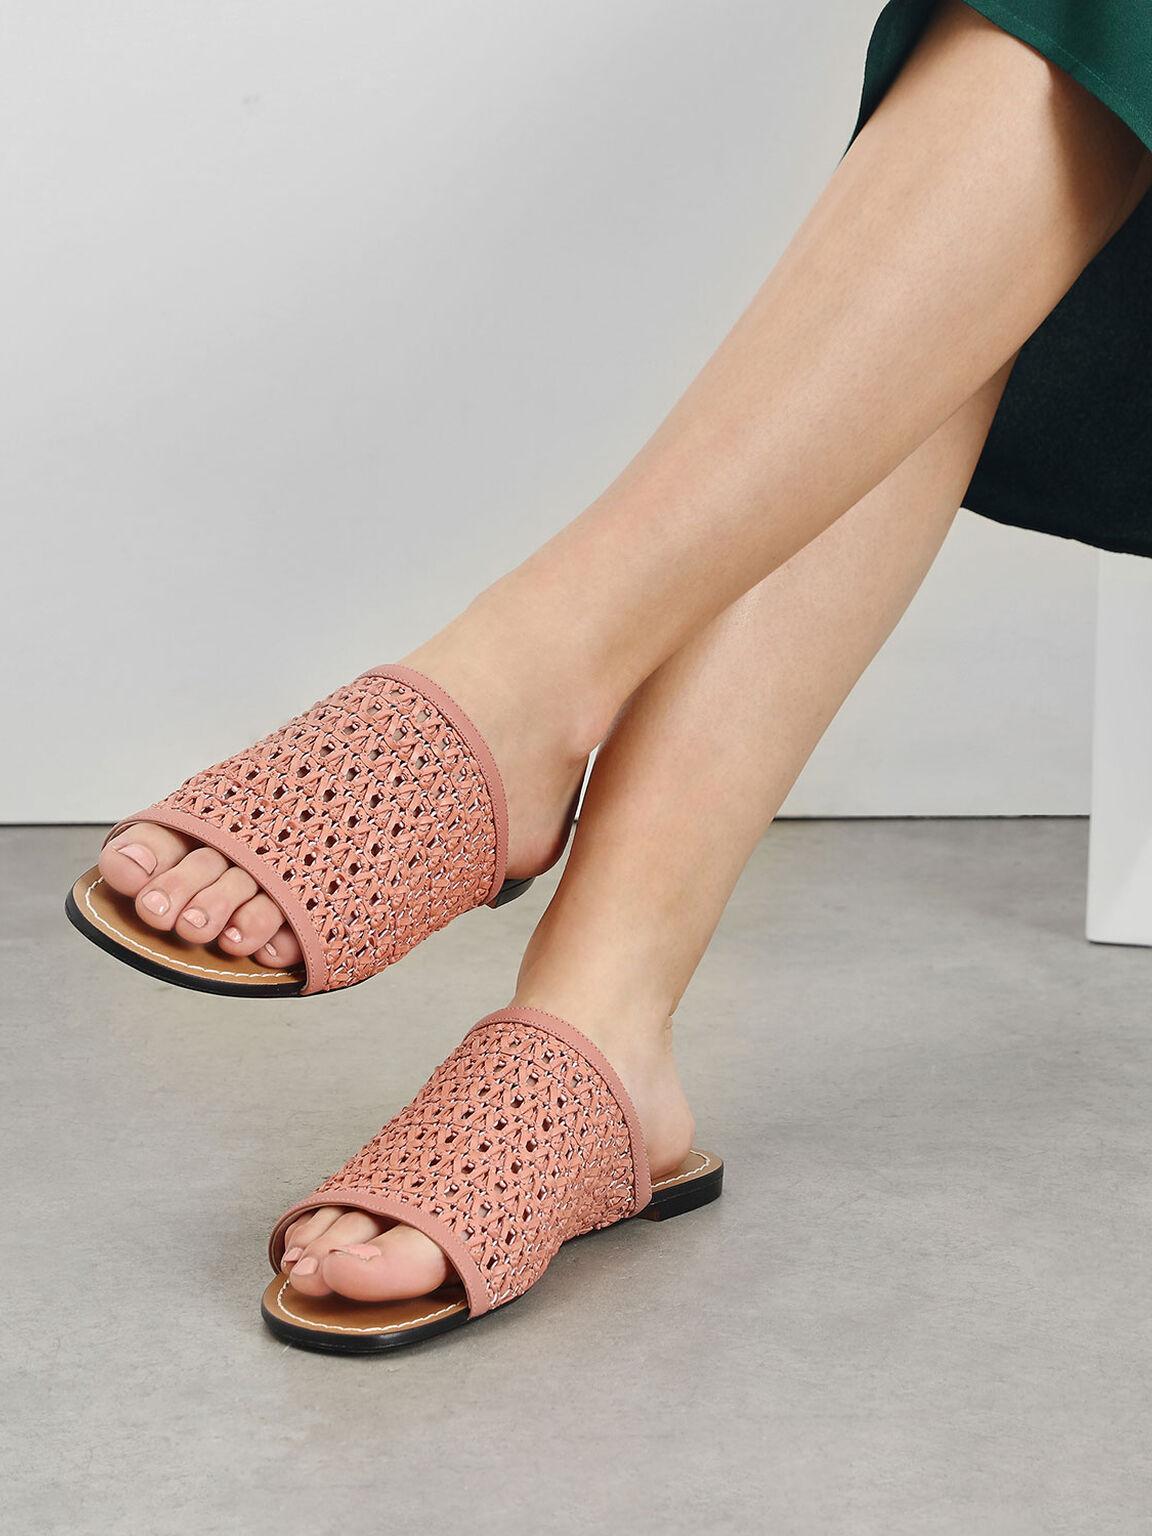 編織平底拖鞋, 嫩粉色, hi-res